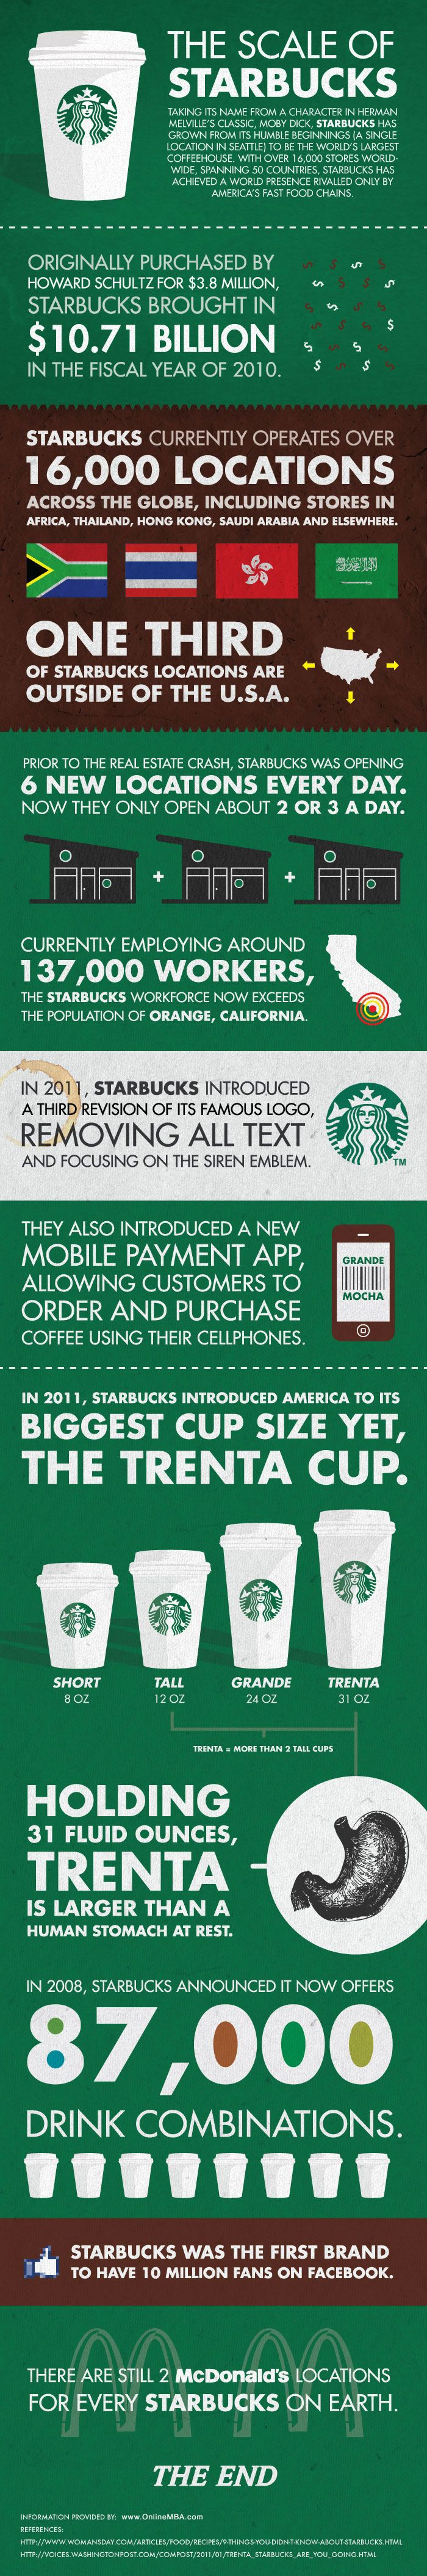 21 Incredible Starbucks Statistics | Smart $$$$ | Pinterest ...